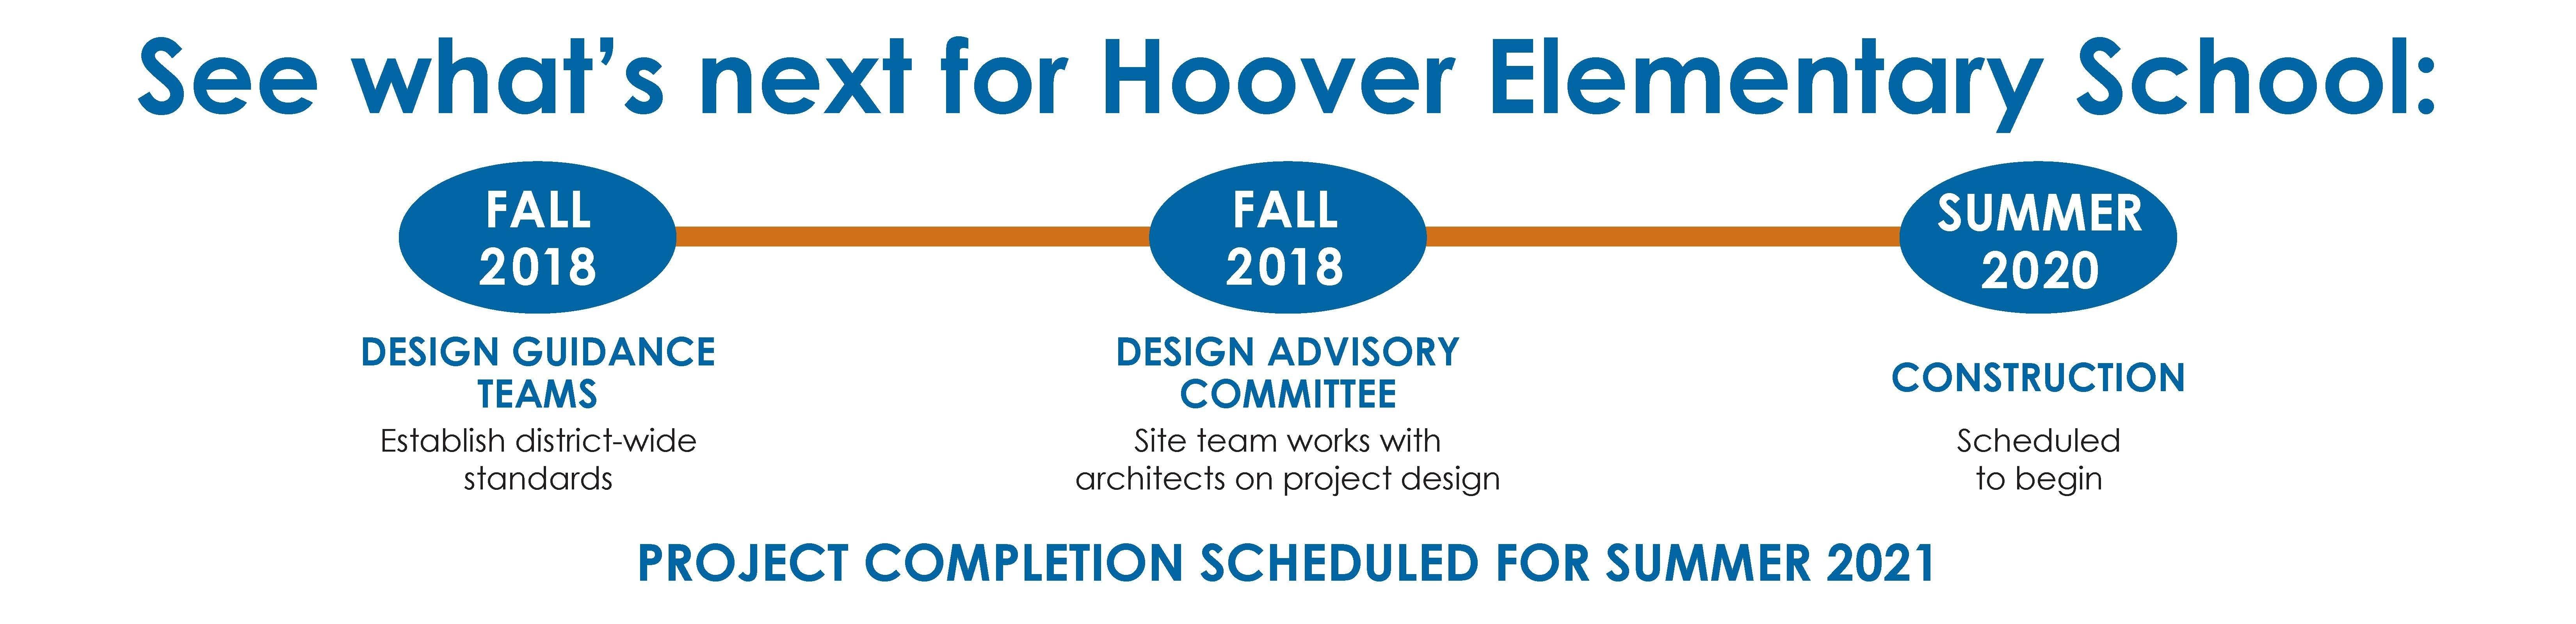 Hoover Elementary – Corvallis School District 509J Calendar 2019